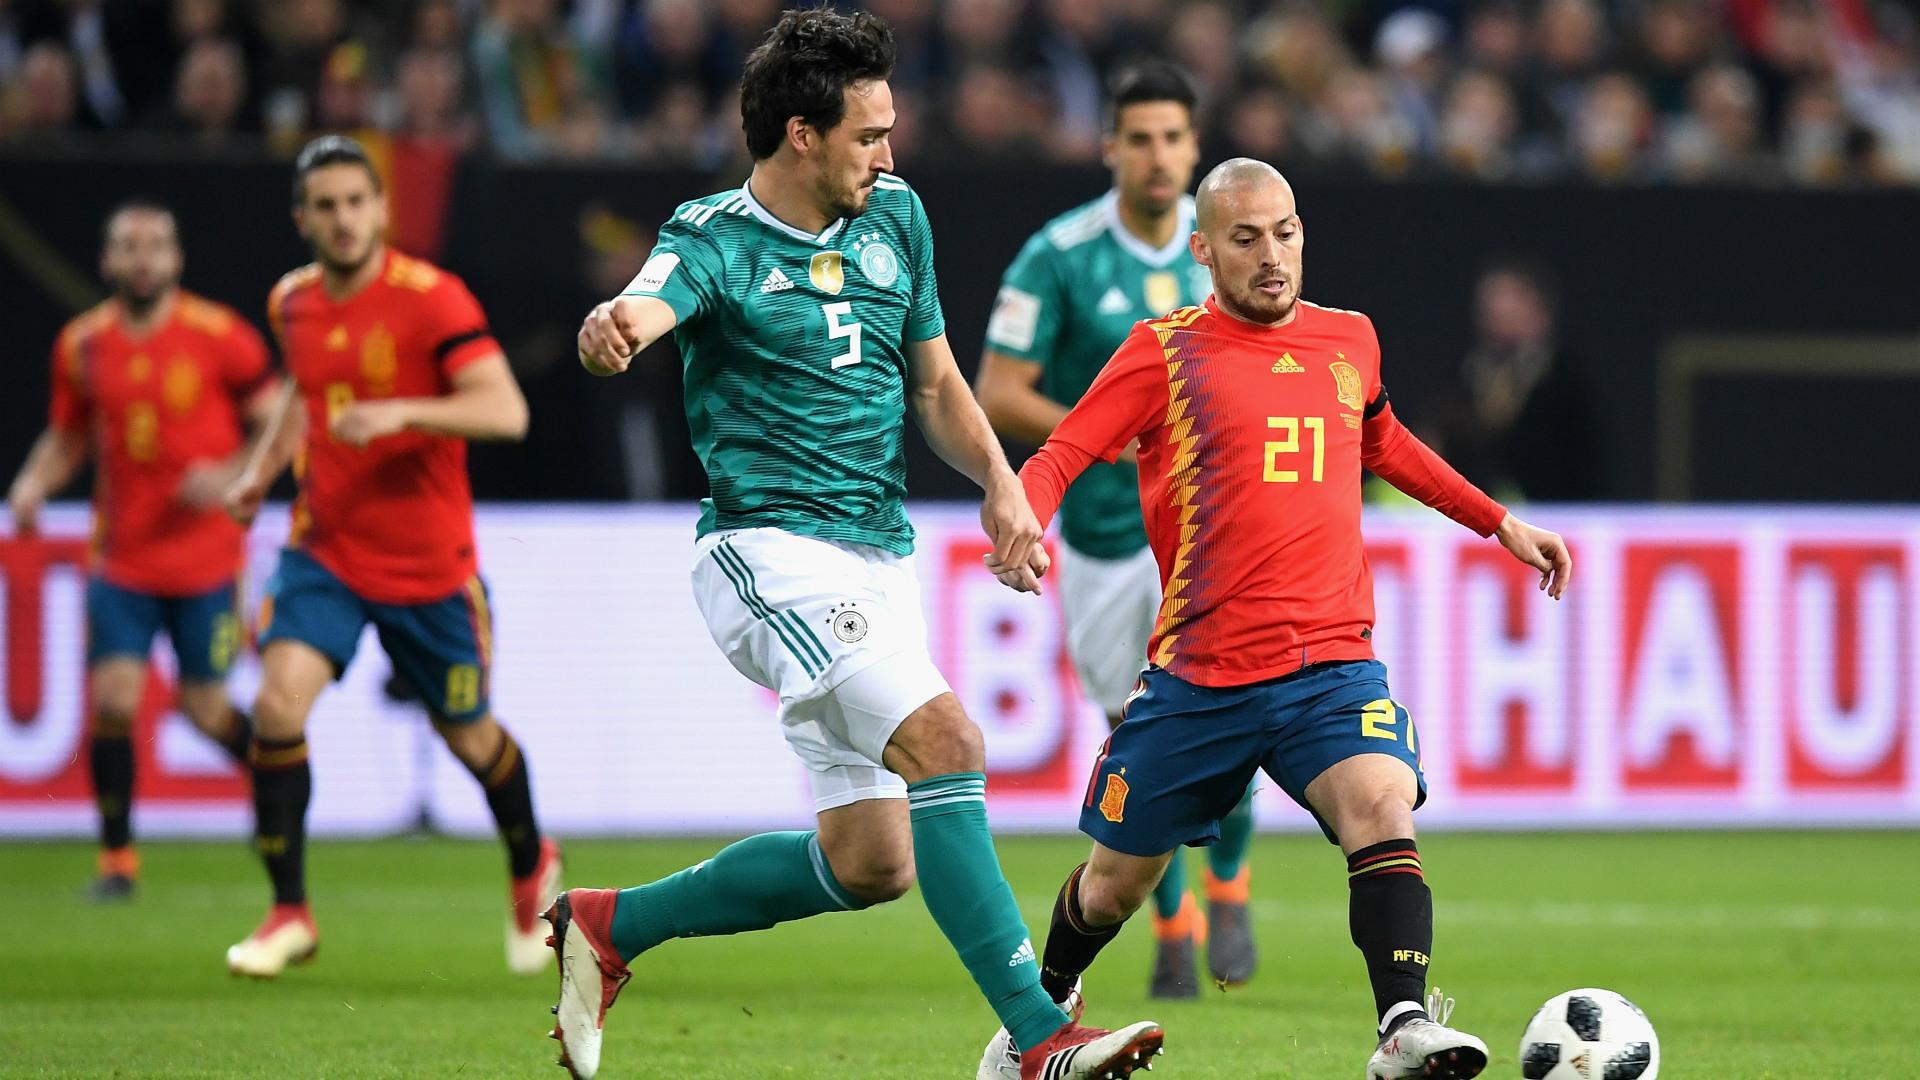 Mats Hummels David Silva Deutschland Spanien Germany Spain 23032018